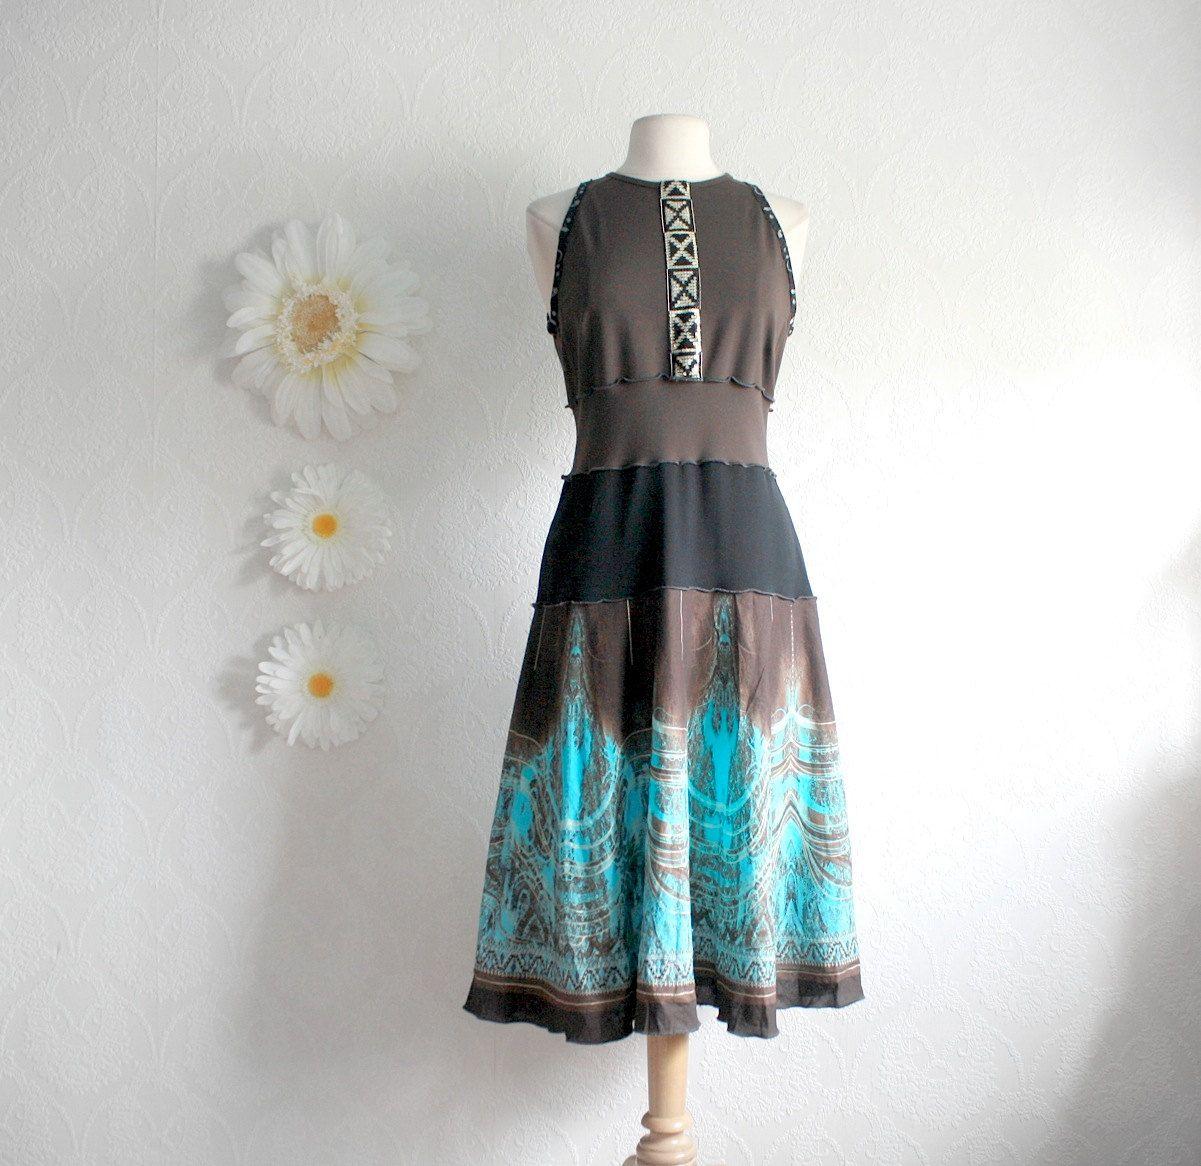 Women's Brown Dress Turquoise Sundress Upcycled Clothing Eco ...